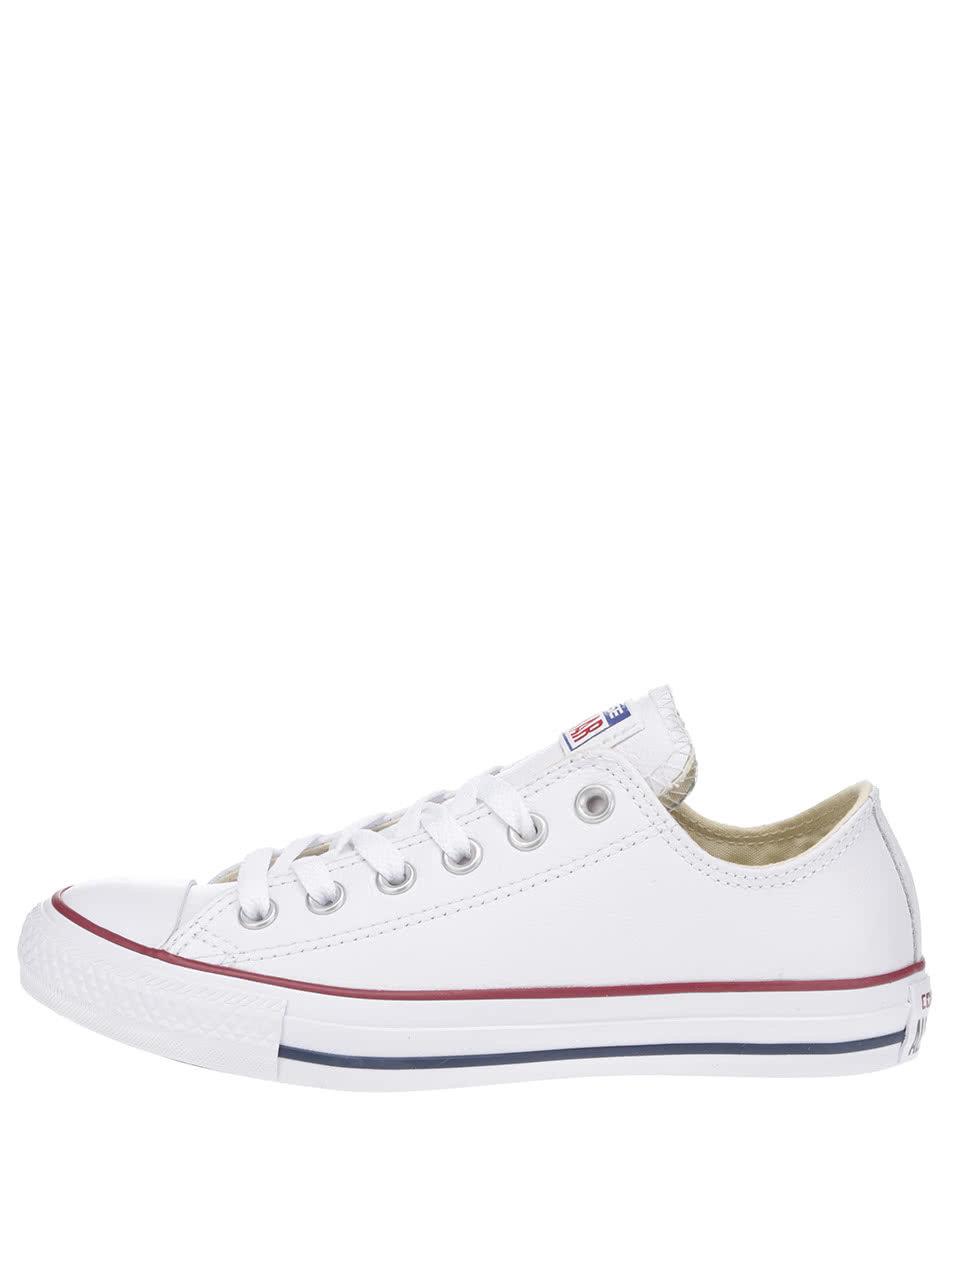 b5fa9c44888 Bílé unisex kožené tenisky Converse Chuck Taylor All Star ...